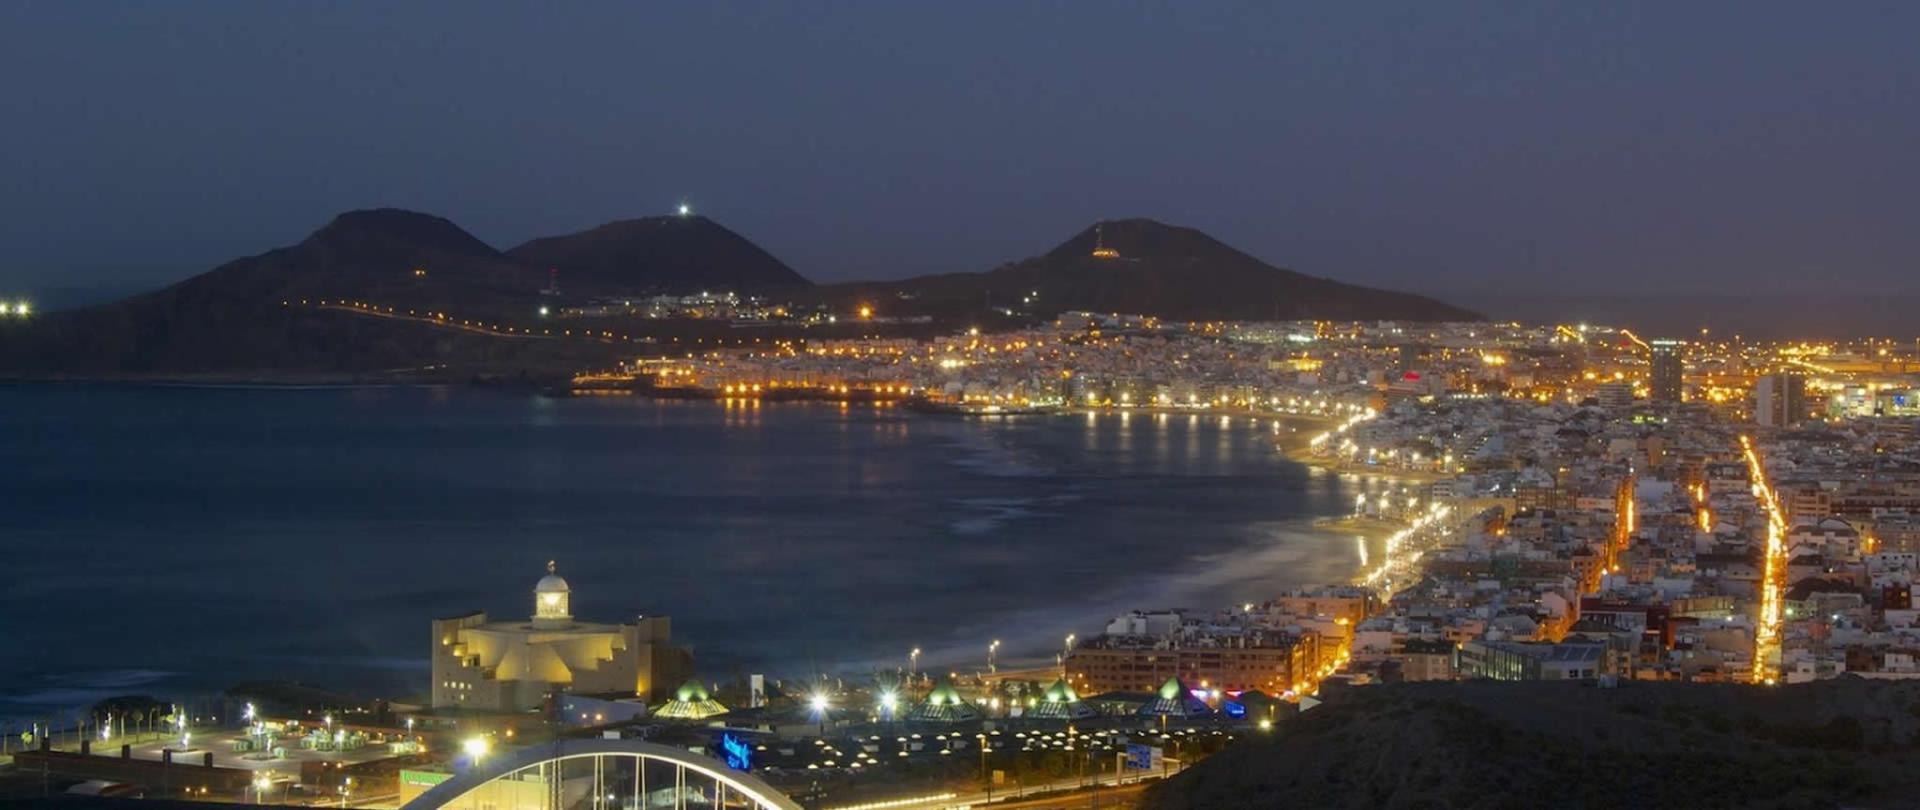 Canteras Noche.jpg